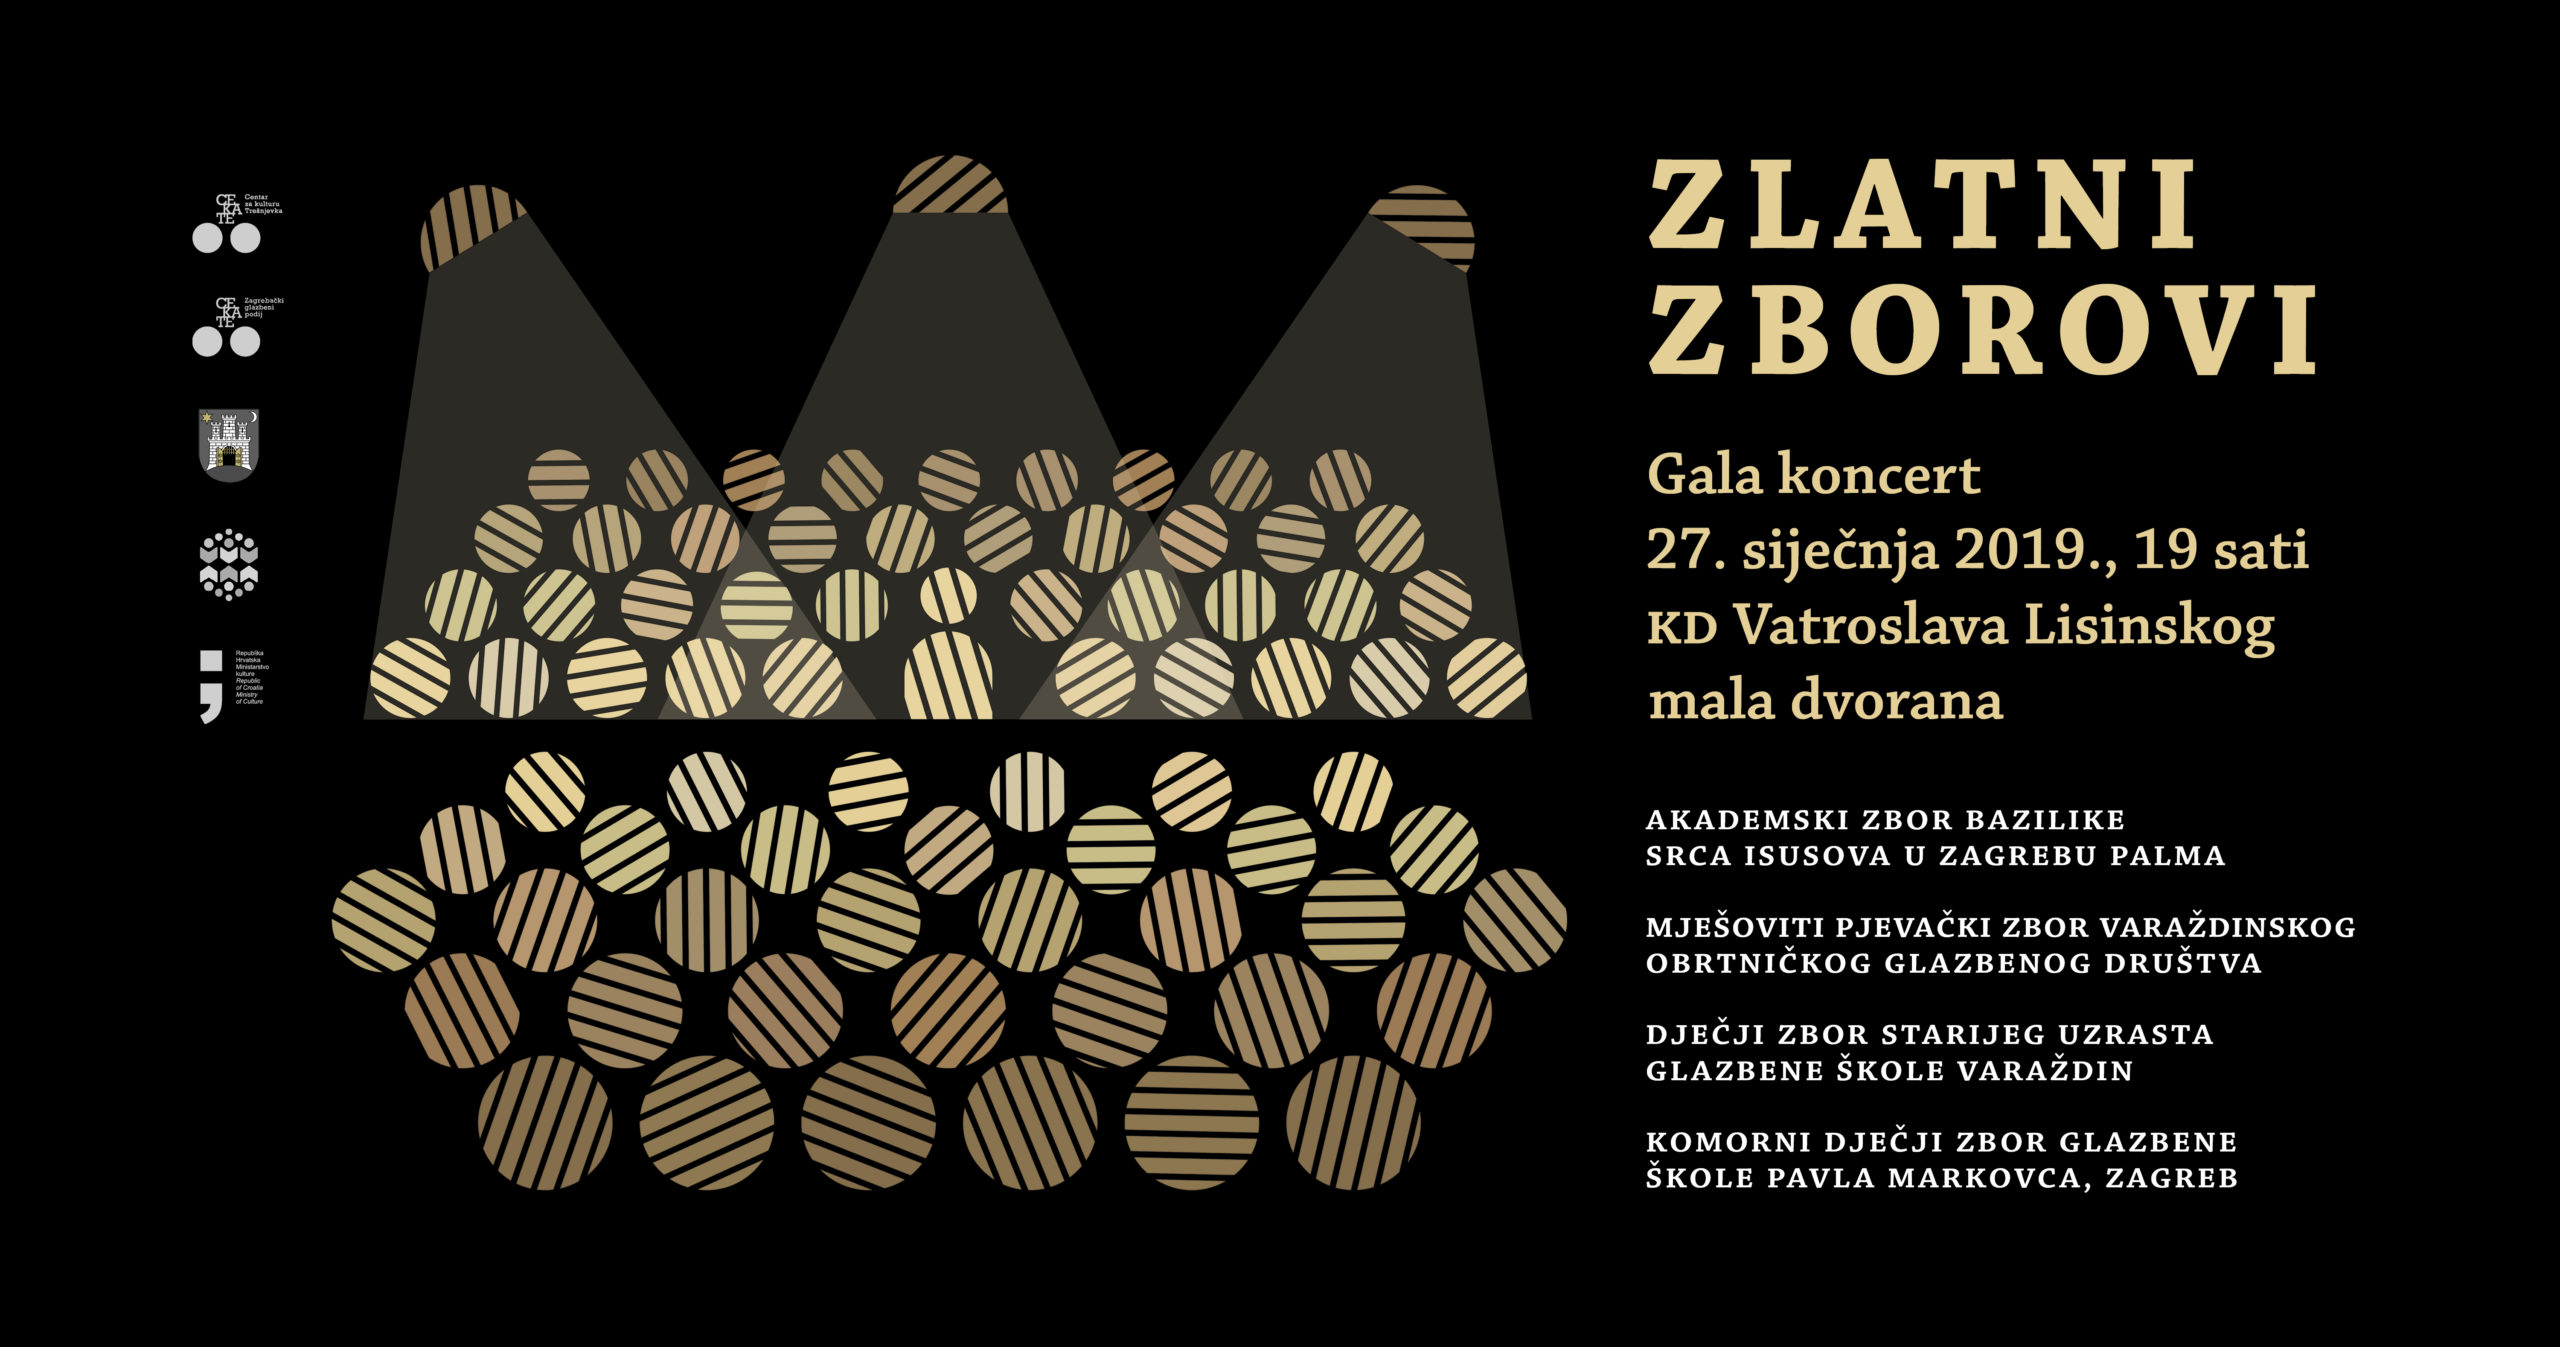 Gala koncert Zlatni zborovi